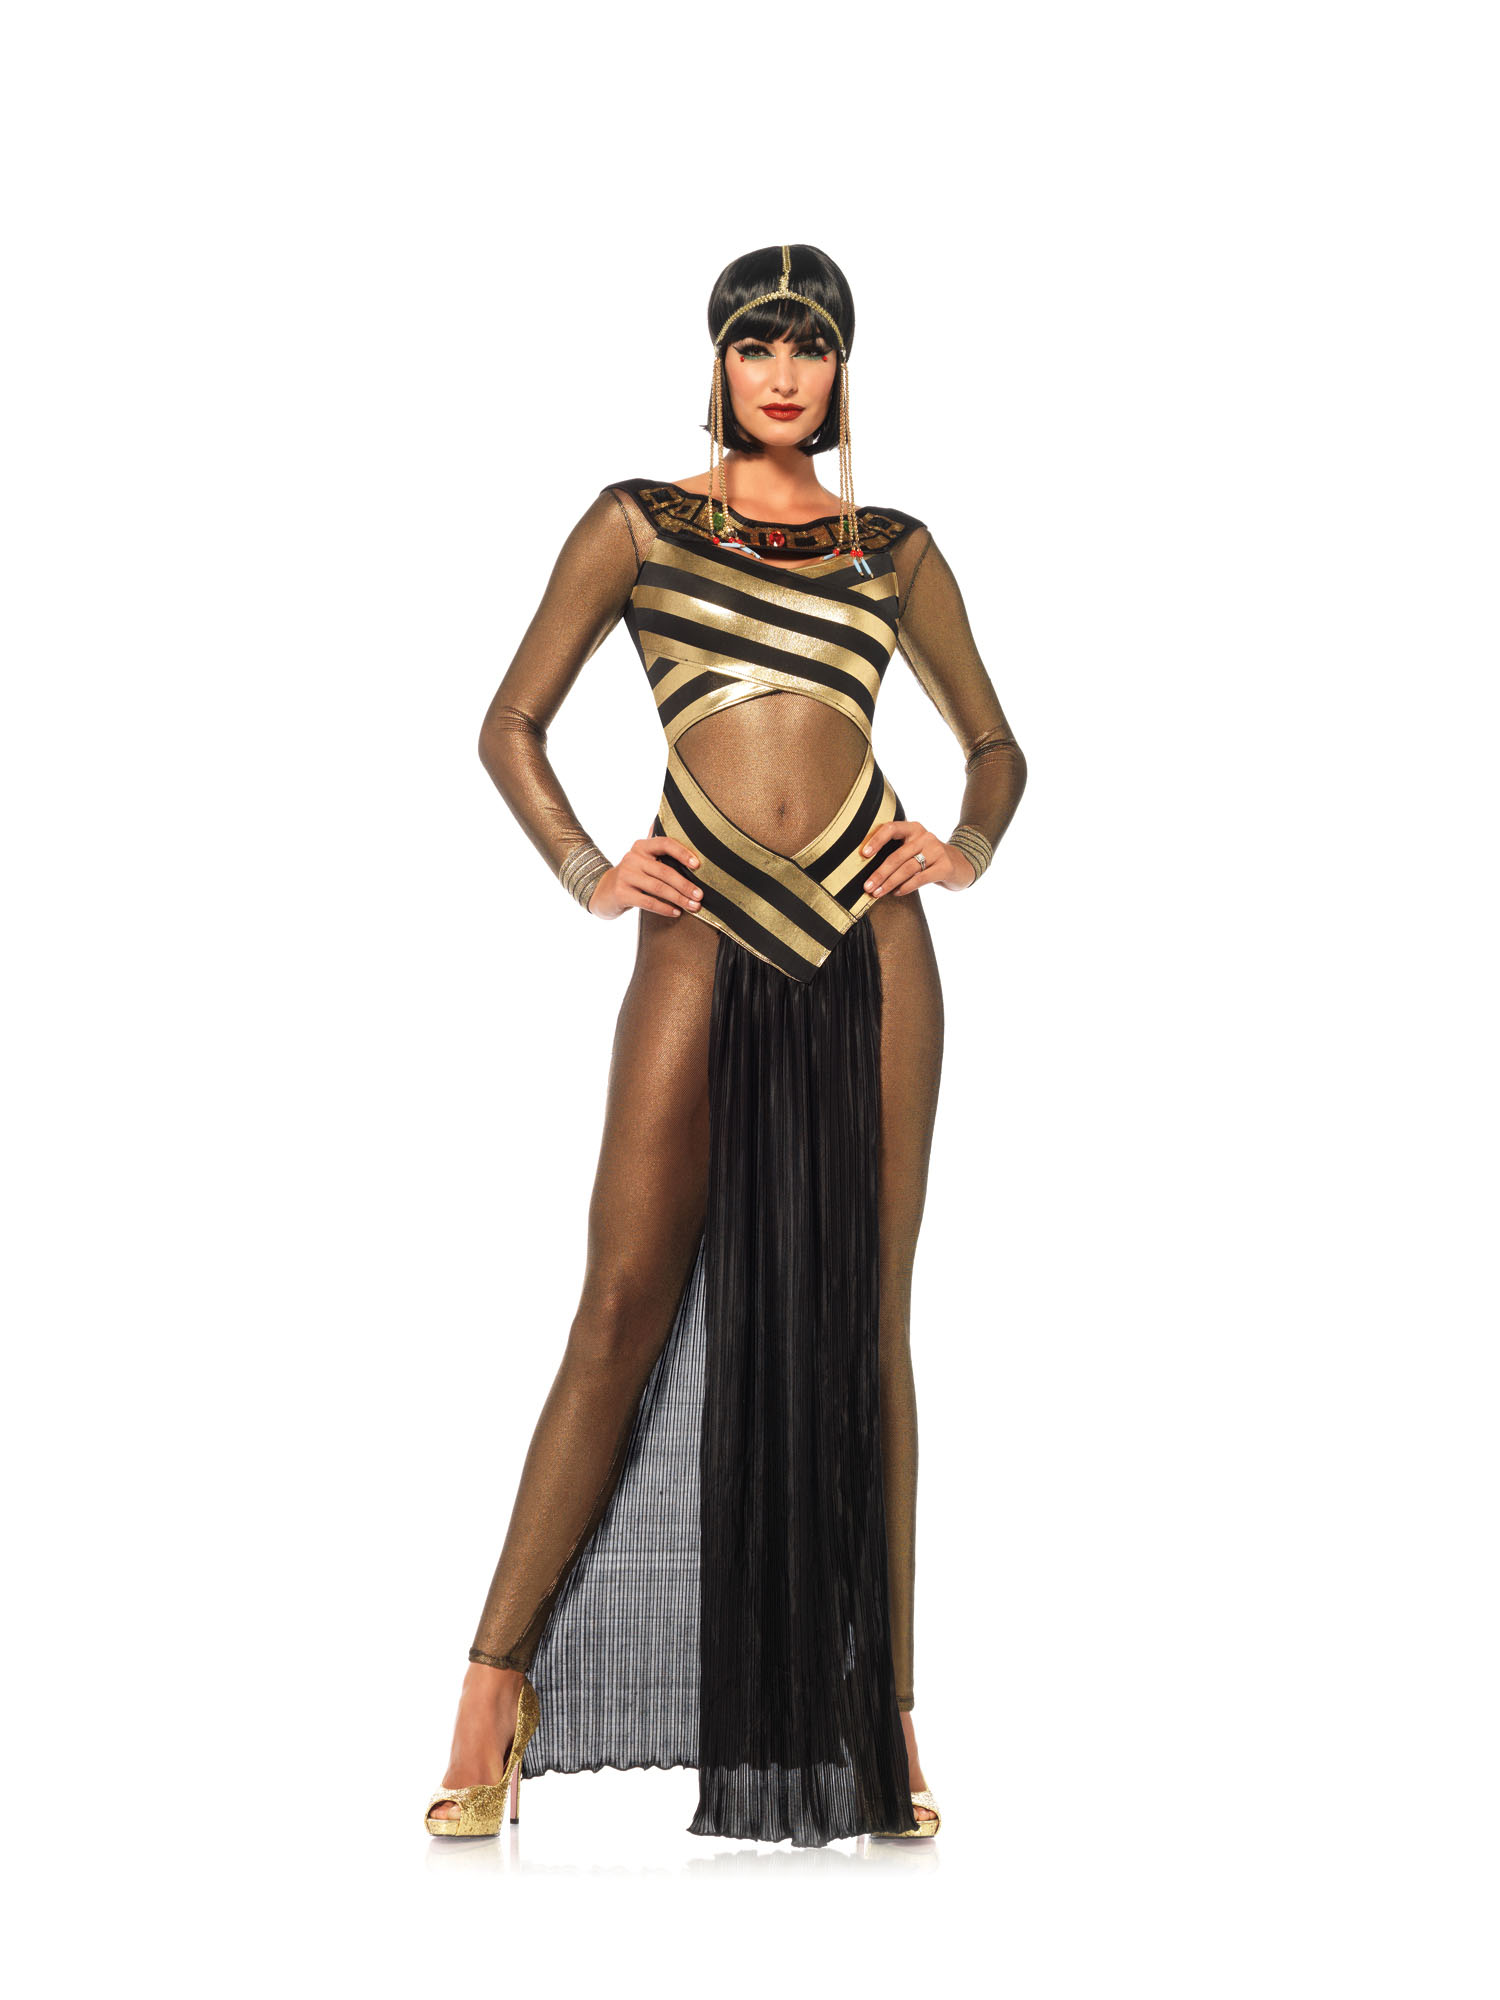 Nile Queen